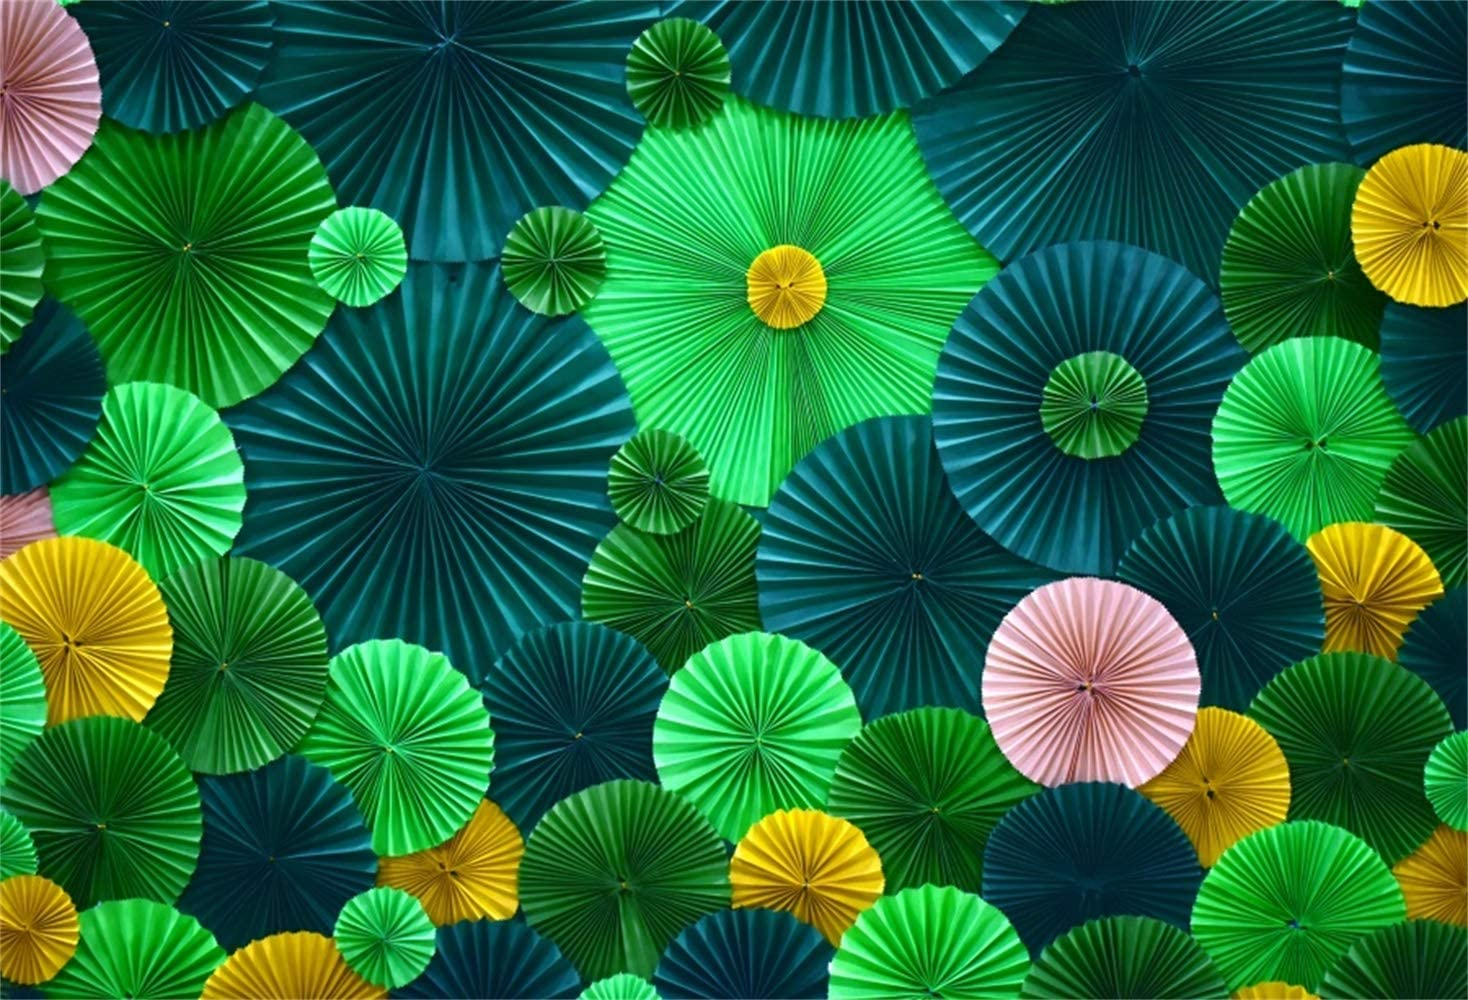 Laeacco Green Tone Handmade Round Paper Flowers 7x5ft Vinyl Photography Background Artistic Portrait Shoot Backdrop Birthday Party Banner Wedding Shoot Indoor Decoration Wallpaper Studio Props